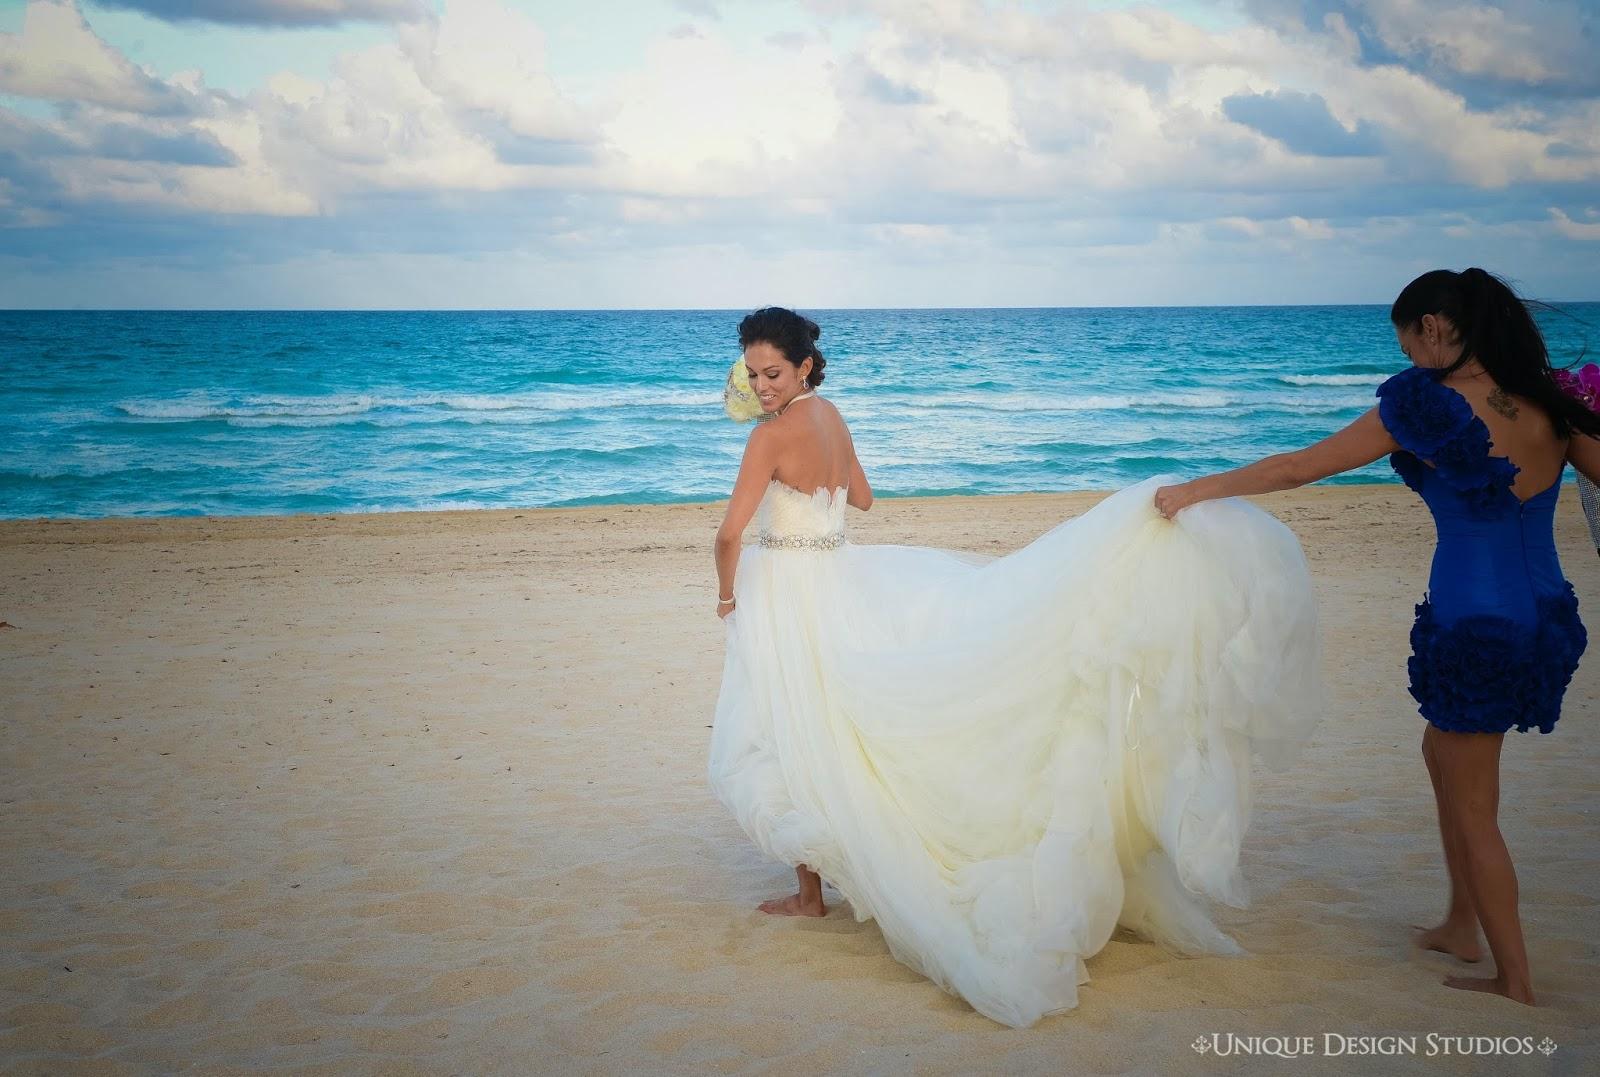 Sarah nicholson wedding